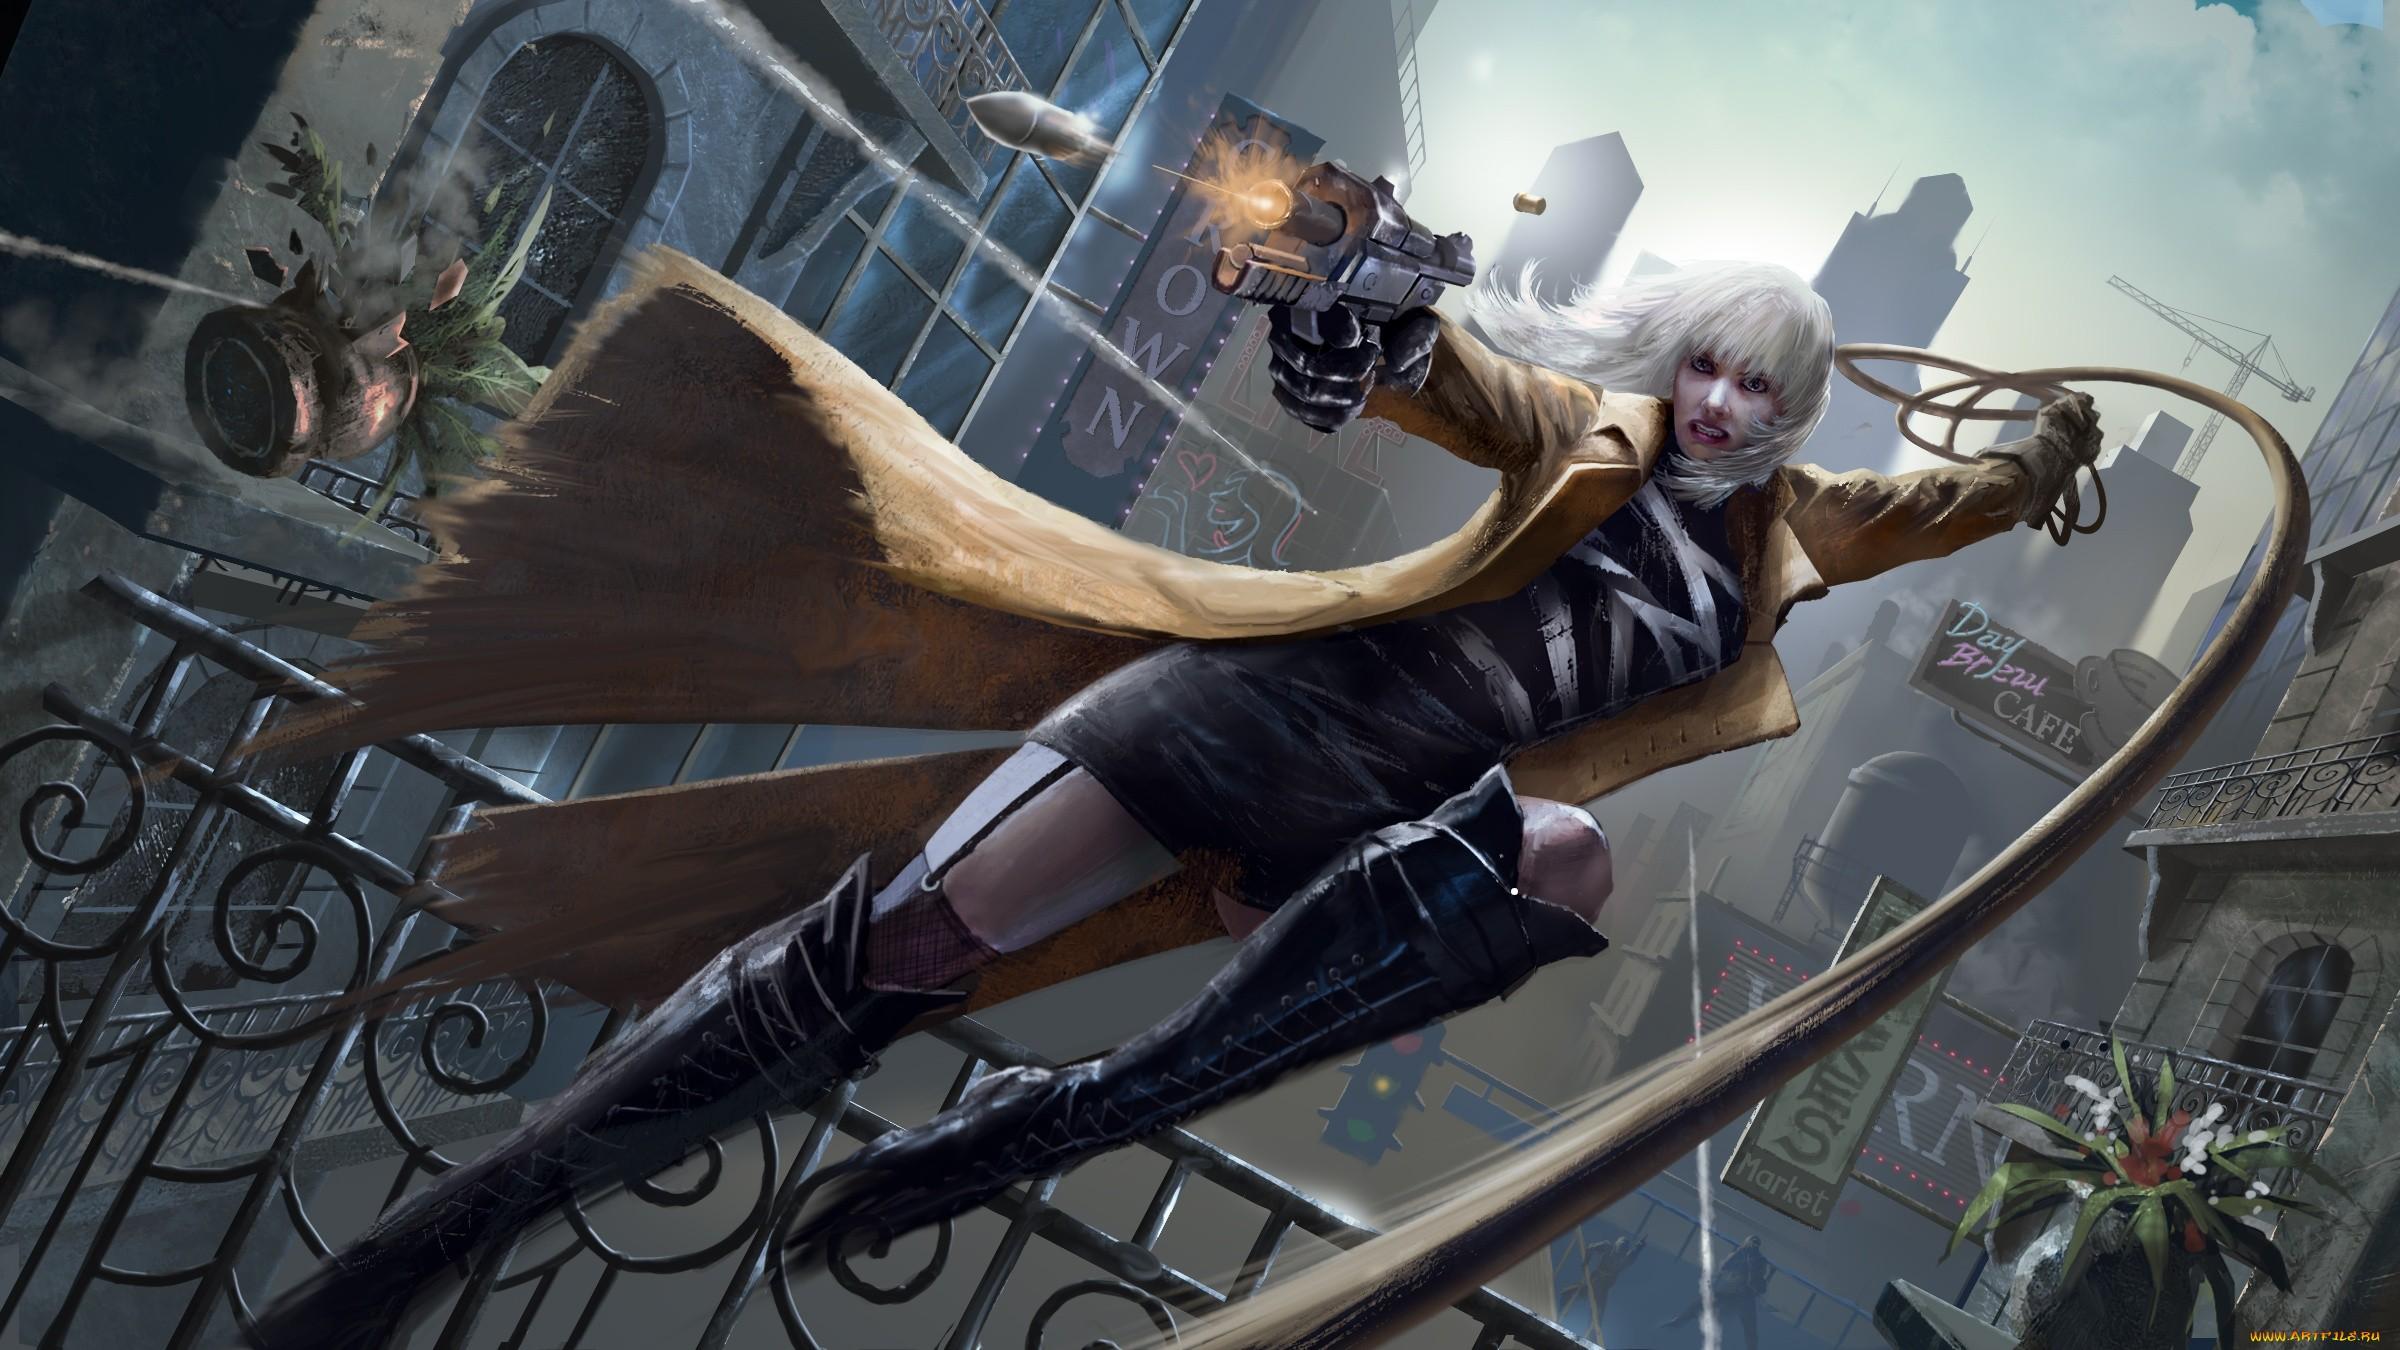 wallpaper artwork women weapon atomic blonde movie